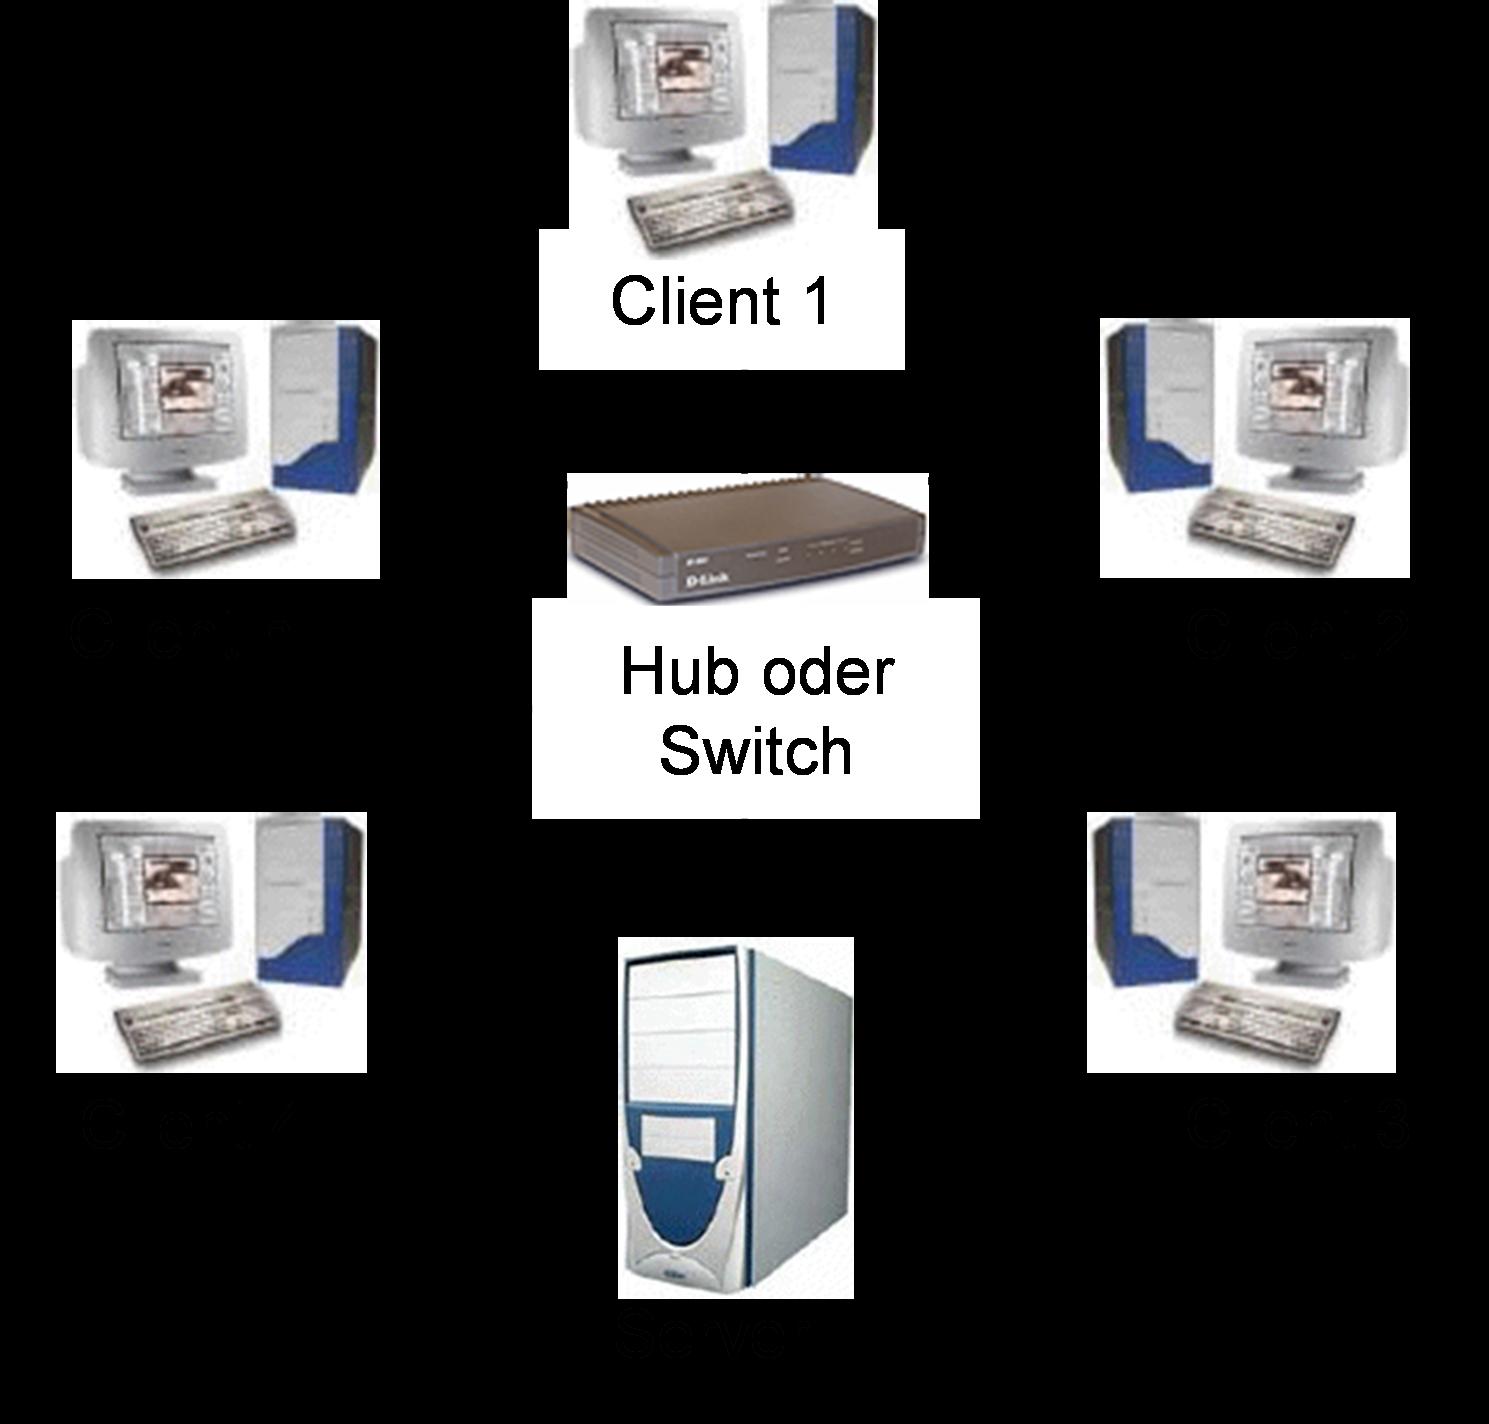 Netzwerk-Computer